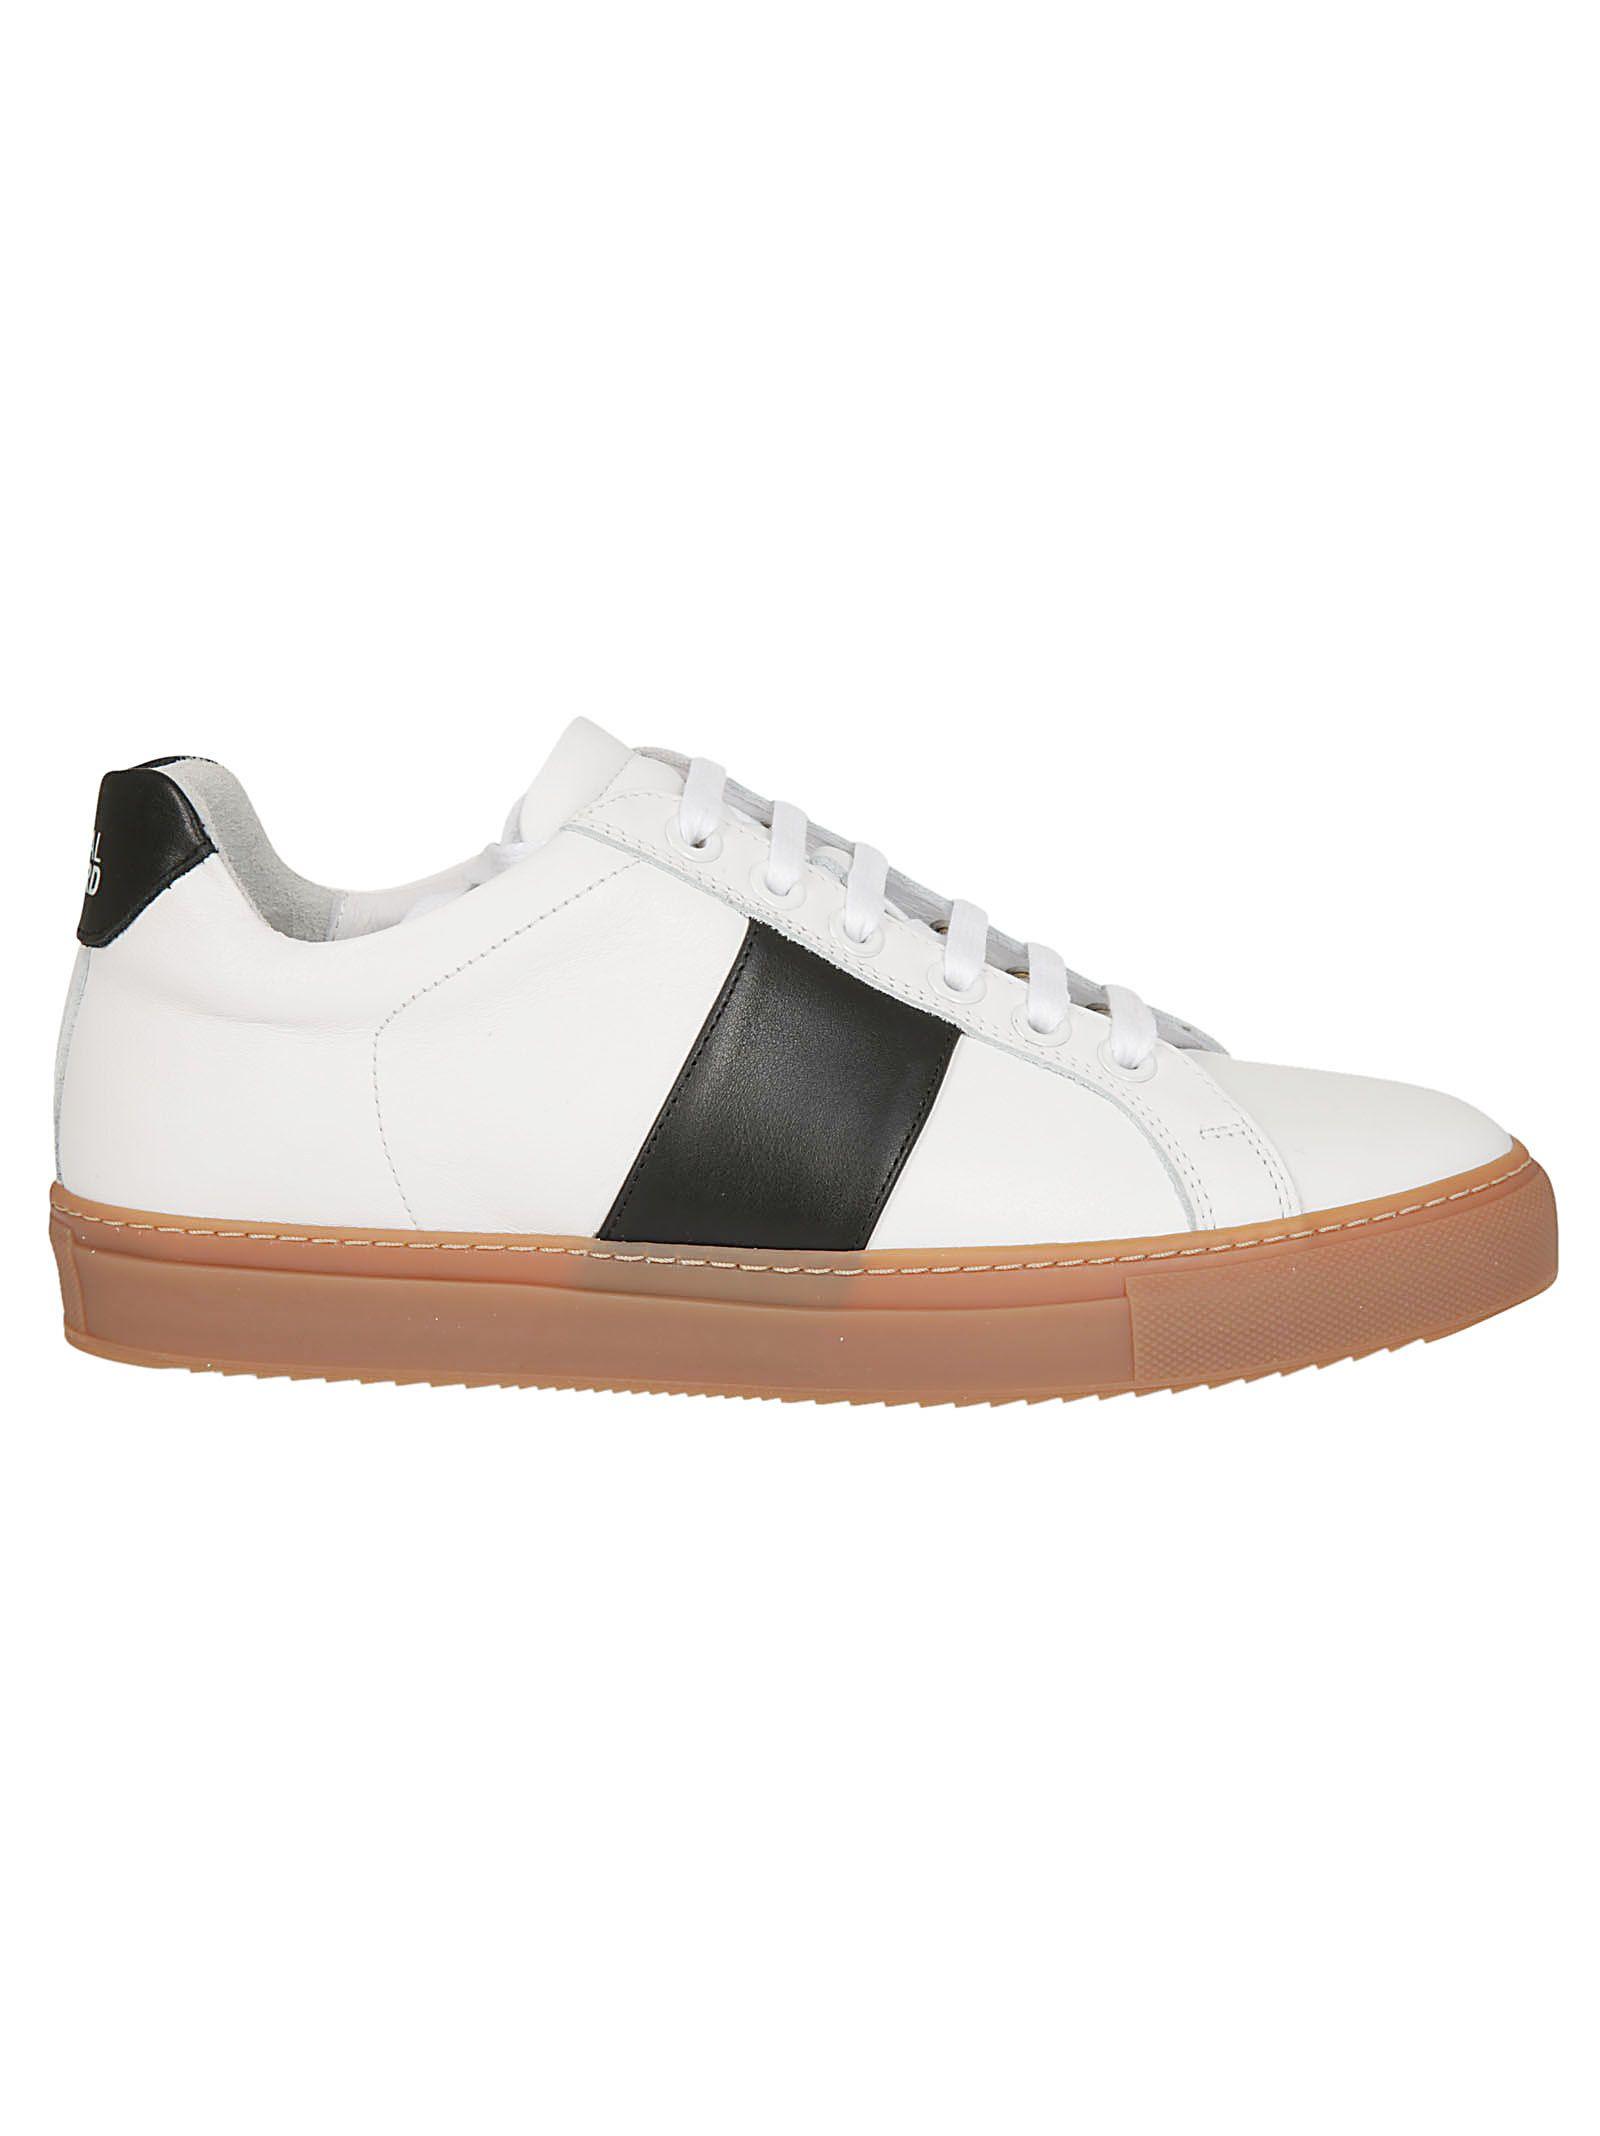 NATIONAL STANDARD Kaliwa Sneakers in Bianca/Nera